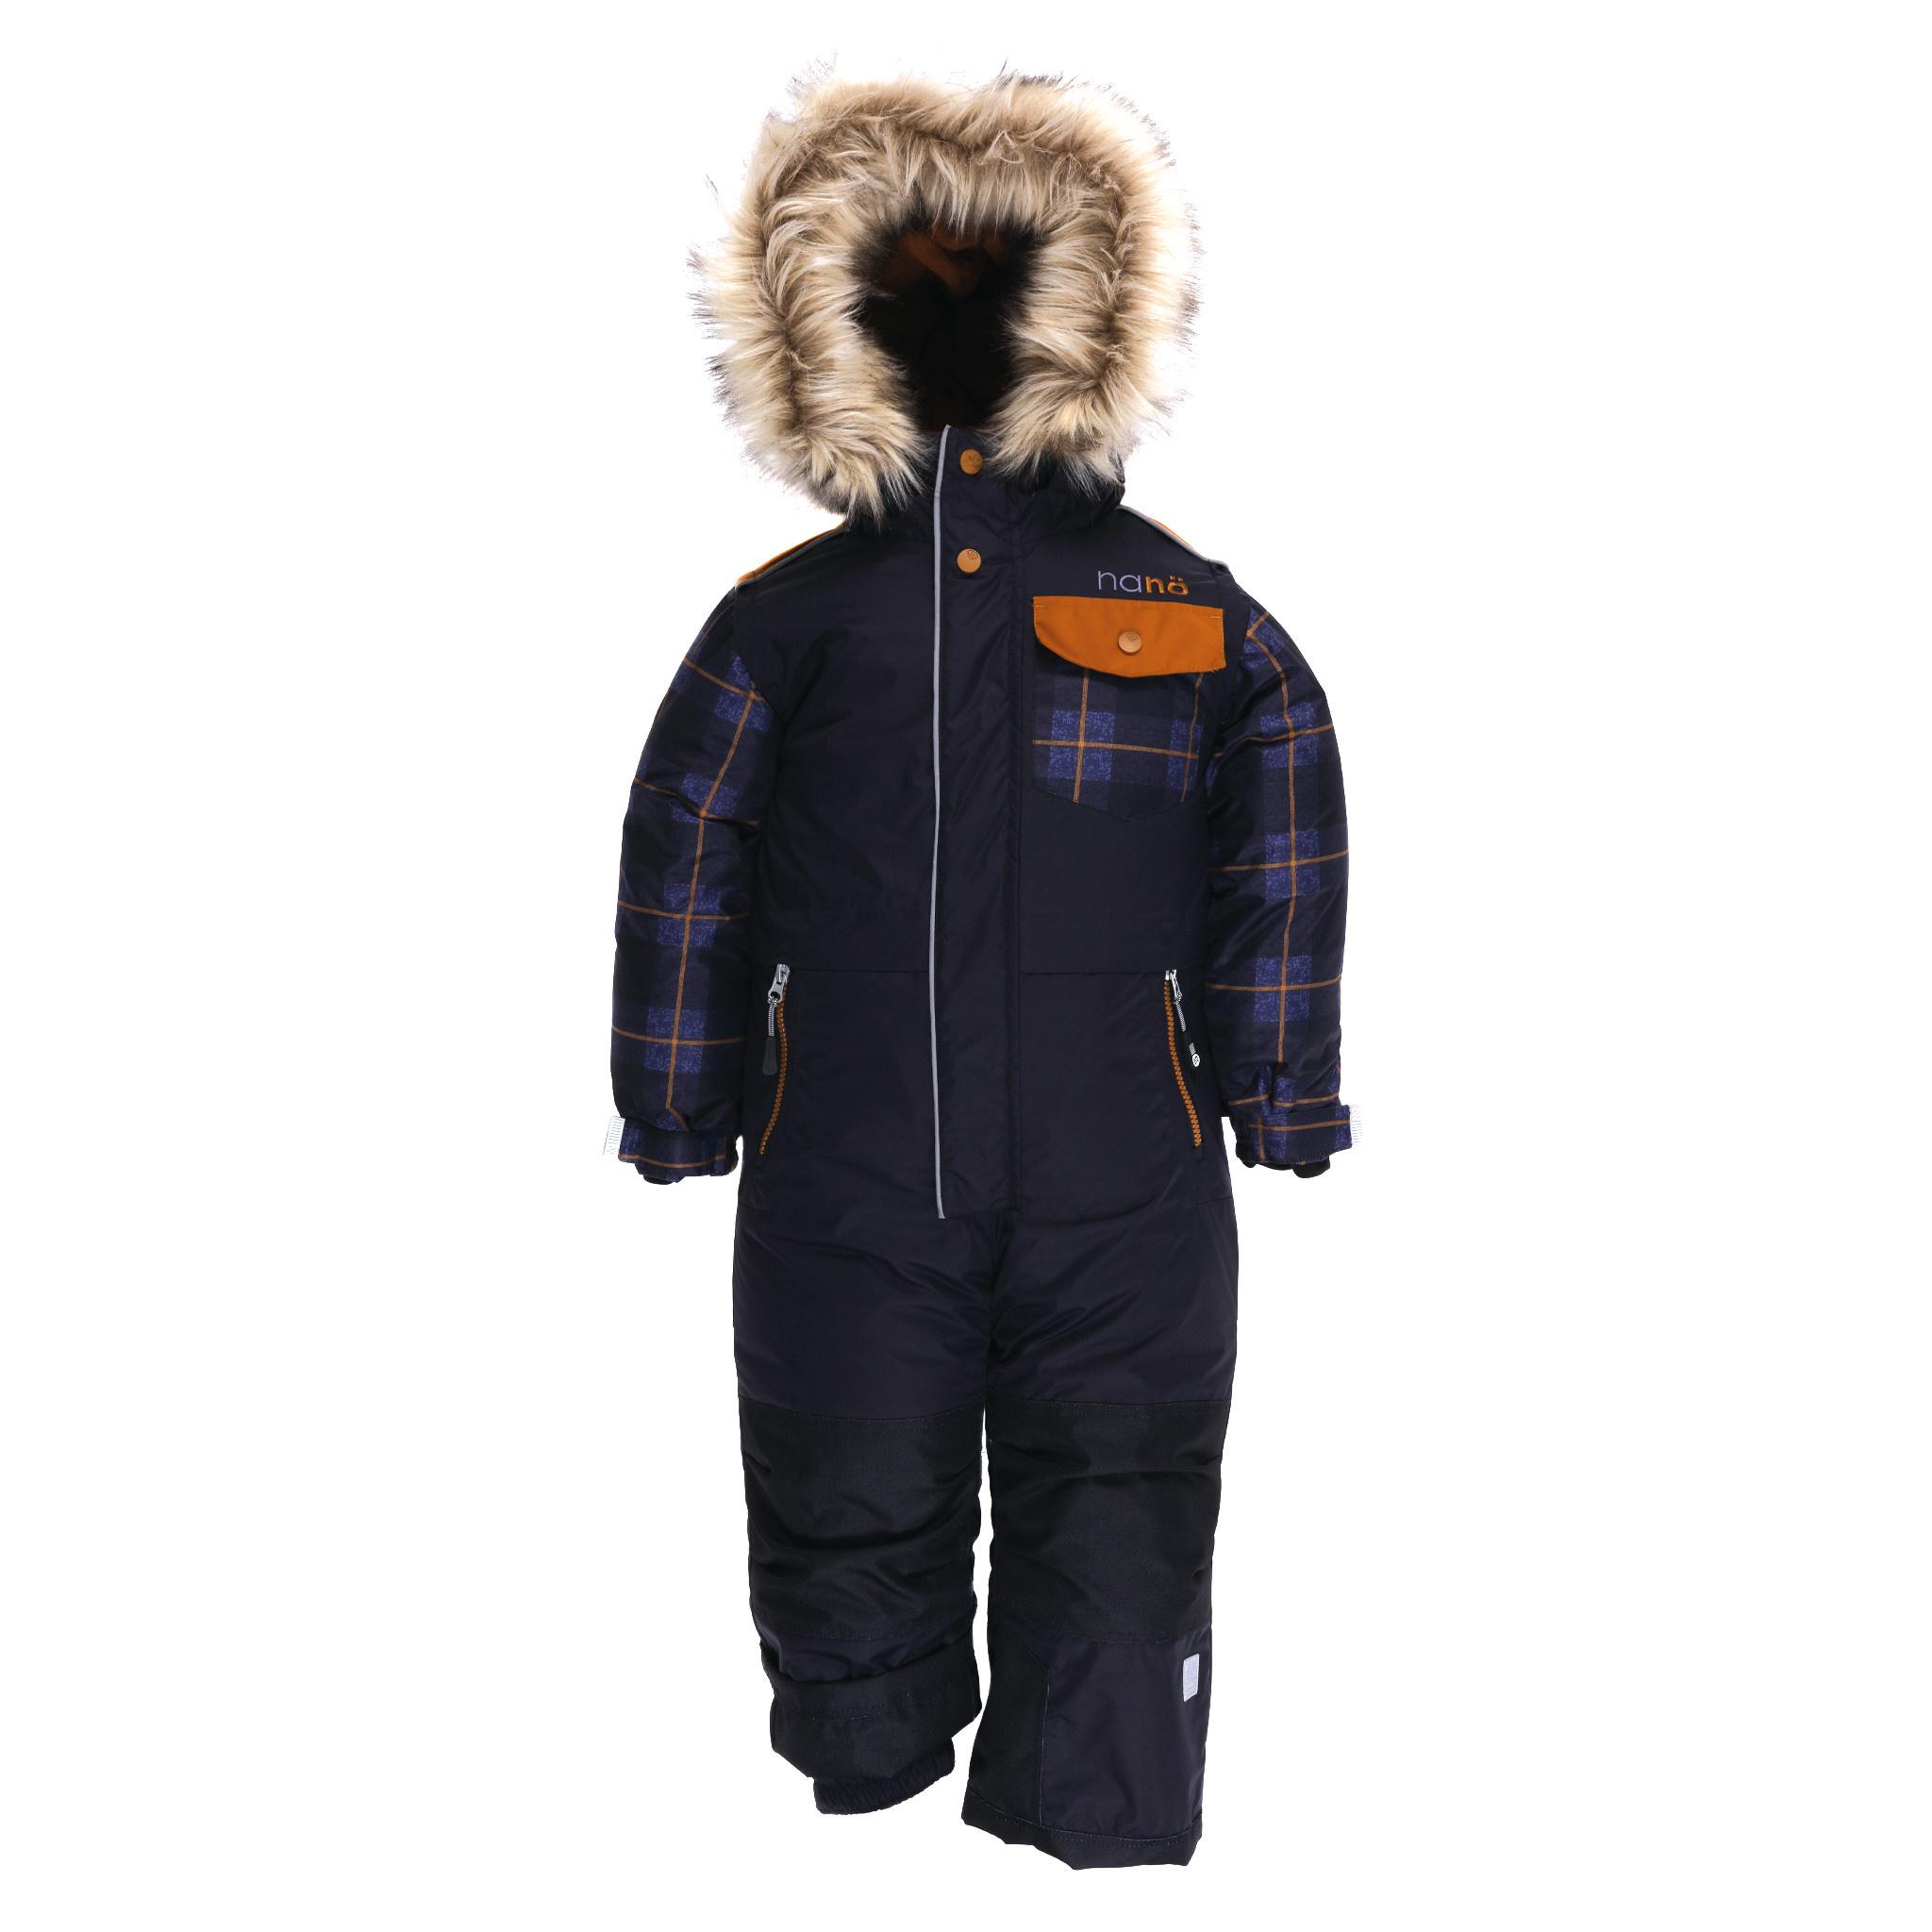 Habit de neige 1 pièce - Mont Cooper-2